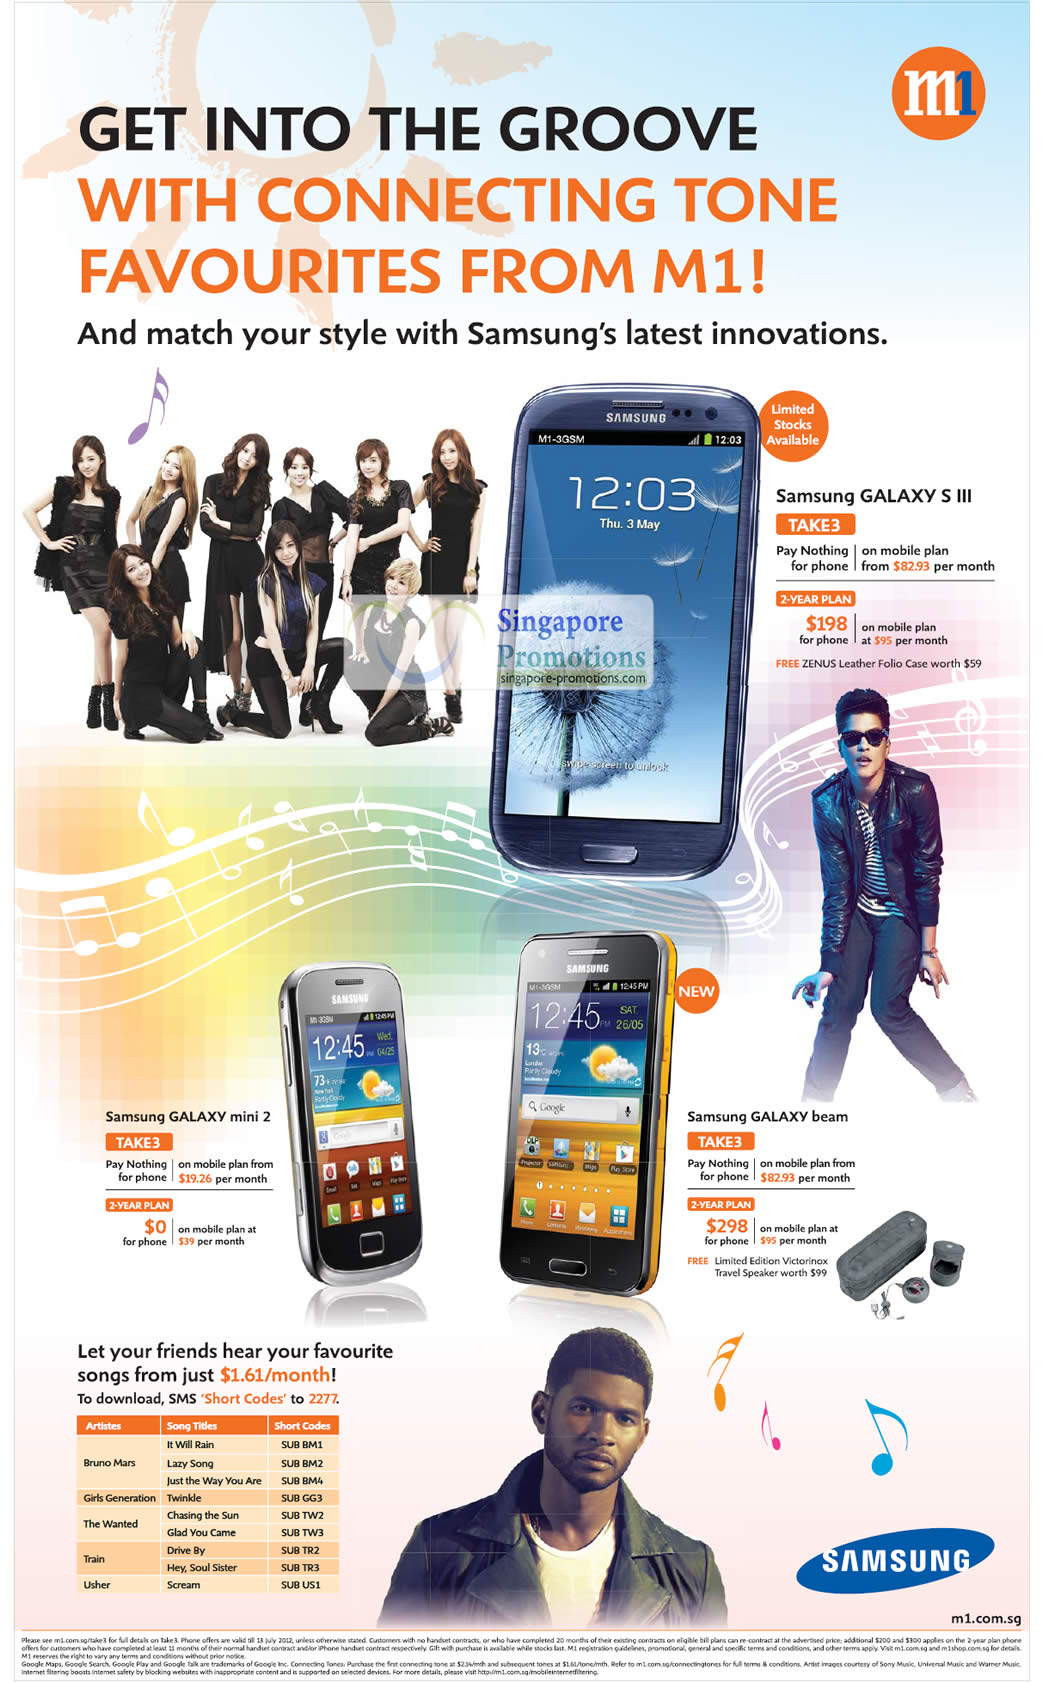 Samsung Galaxy S III, Samsung Galaxy Mini 2, Samsung Galaxy Beam